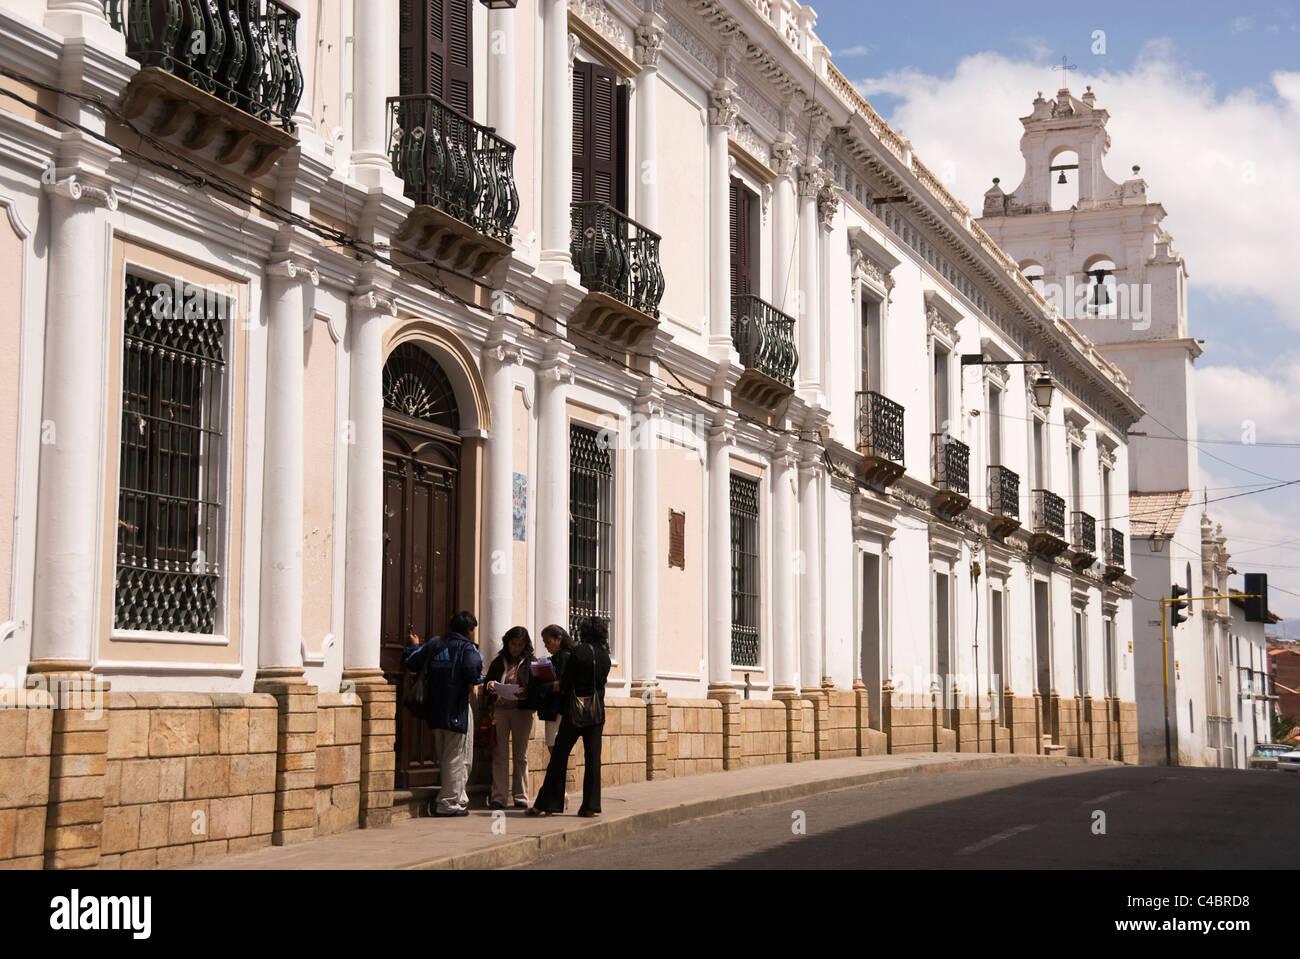 Sucre, Universidad Andina Simon Bolivar, university buildings with students - Stock Image